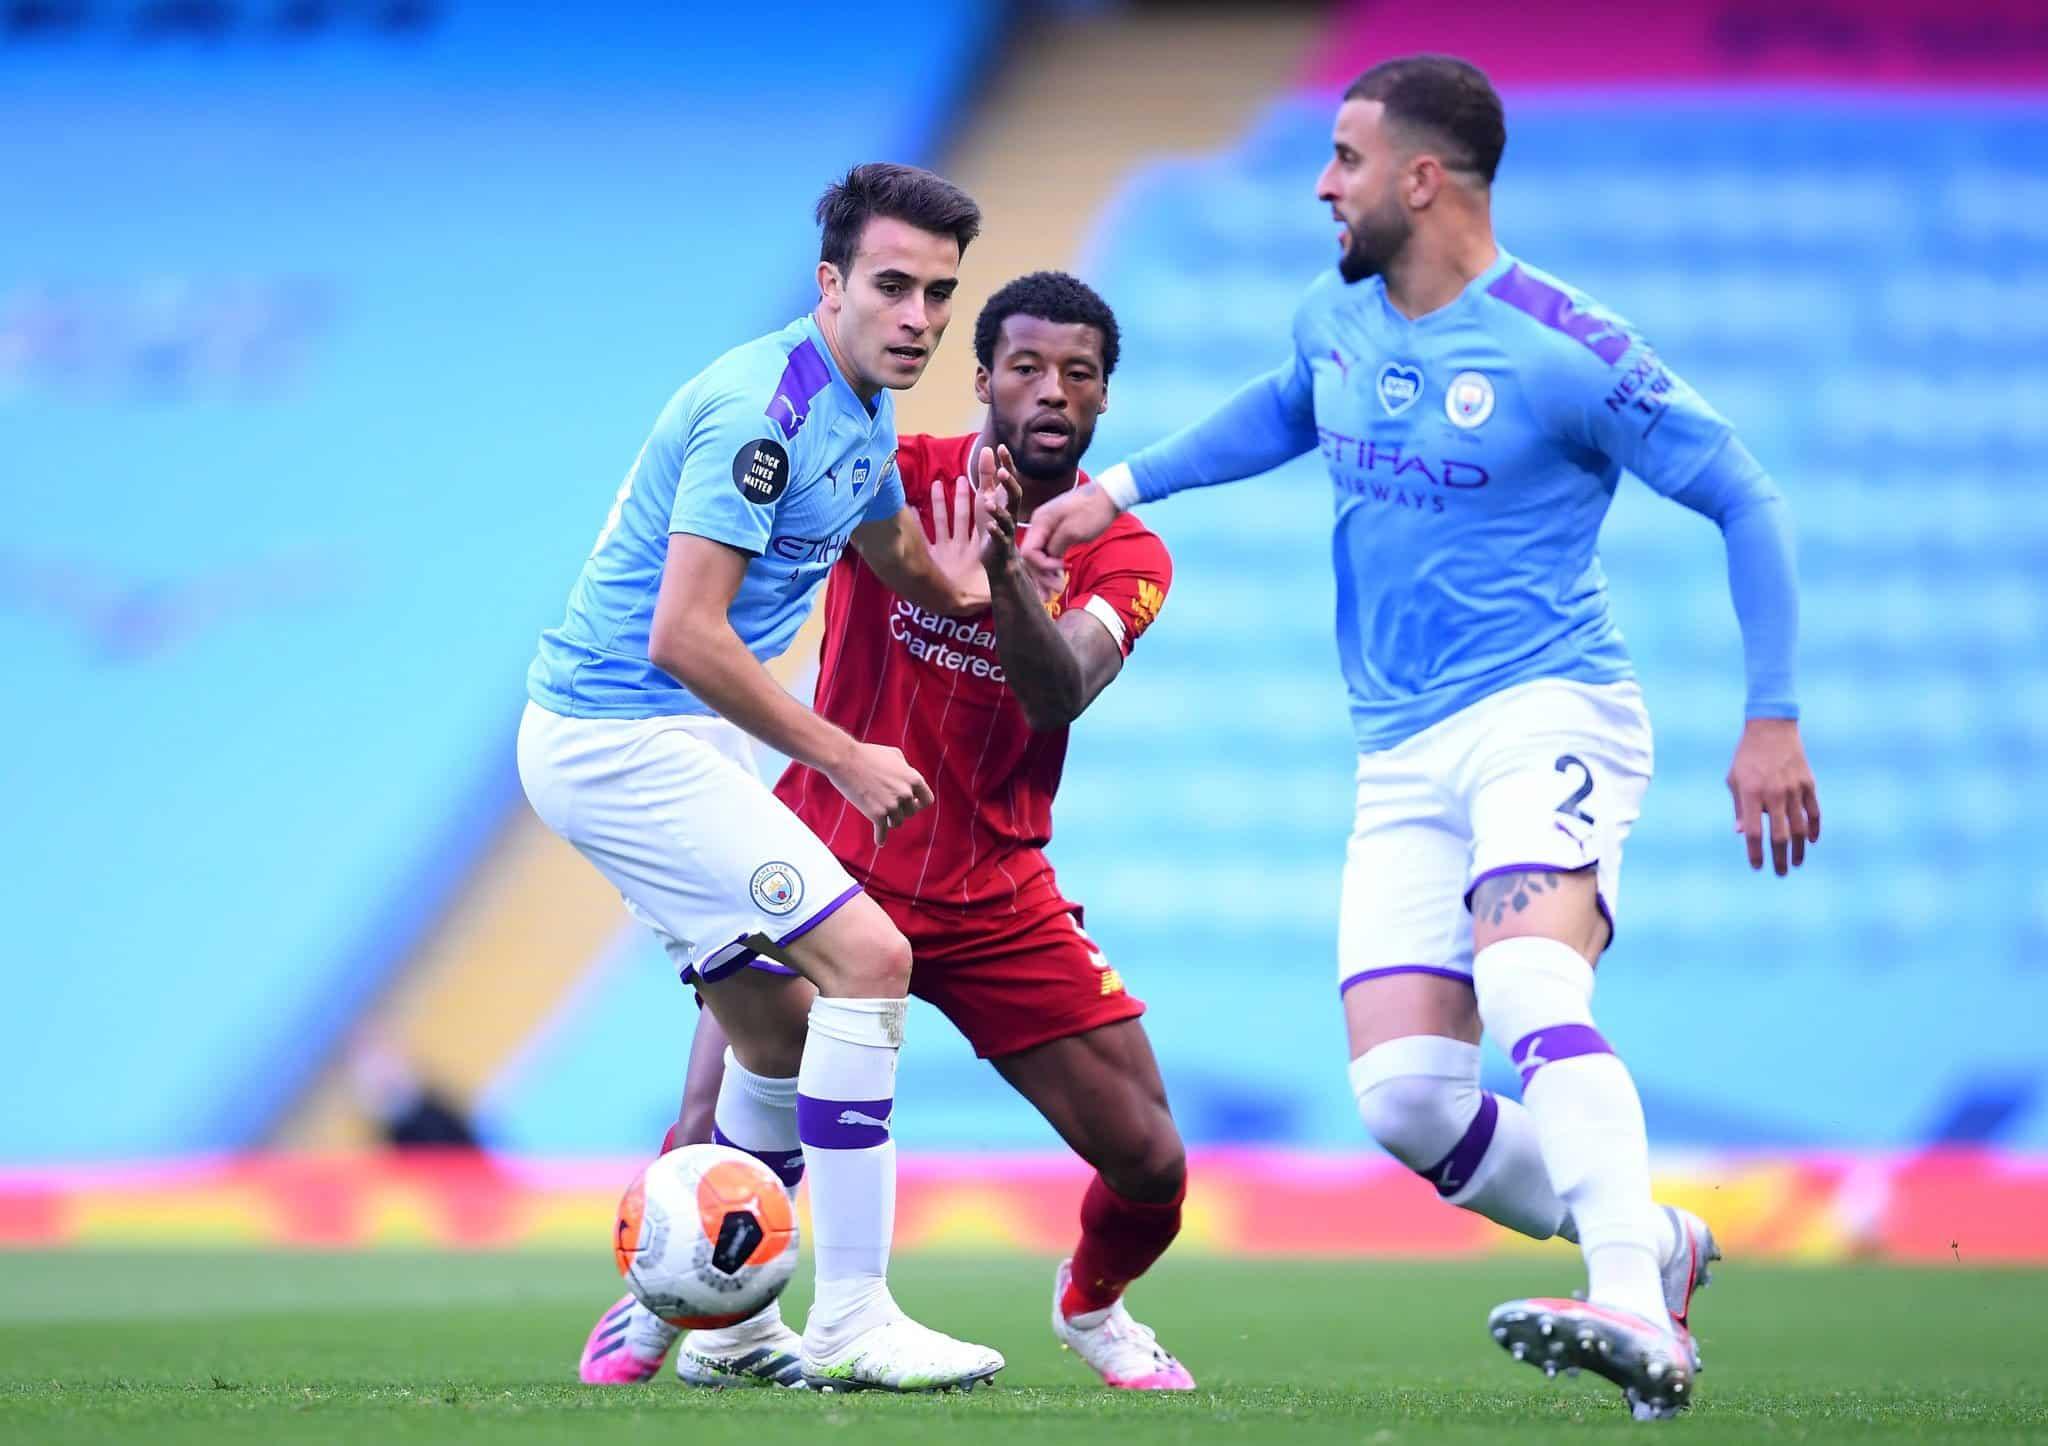 Pep Guardiola hints John Stones could leave Manchester City